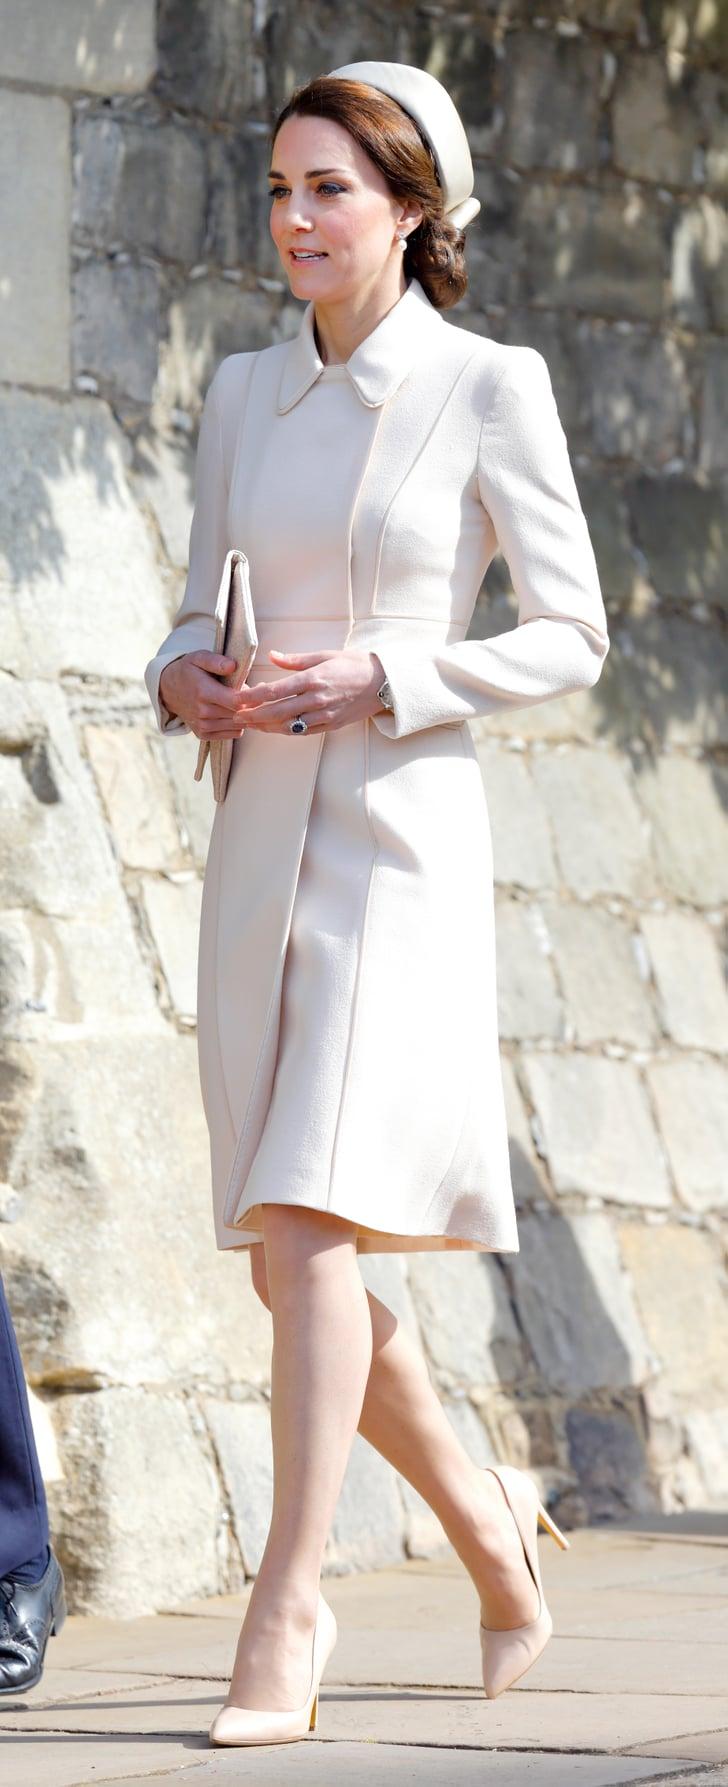 Kate In Catherine Walker April 2017 Kate Middleton Best